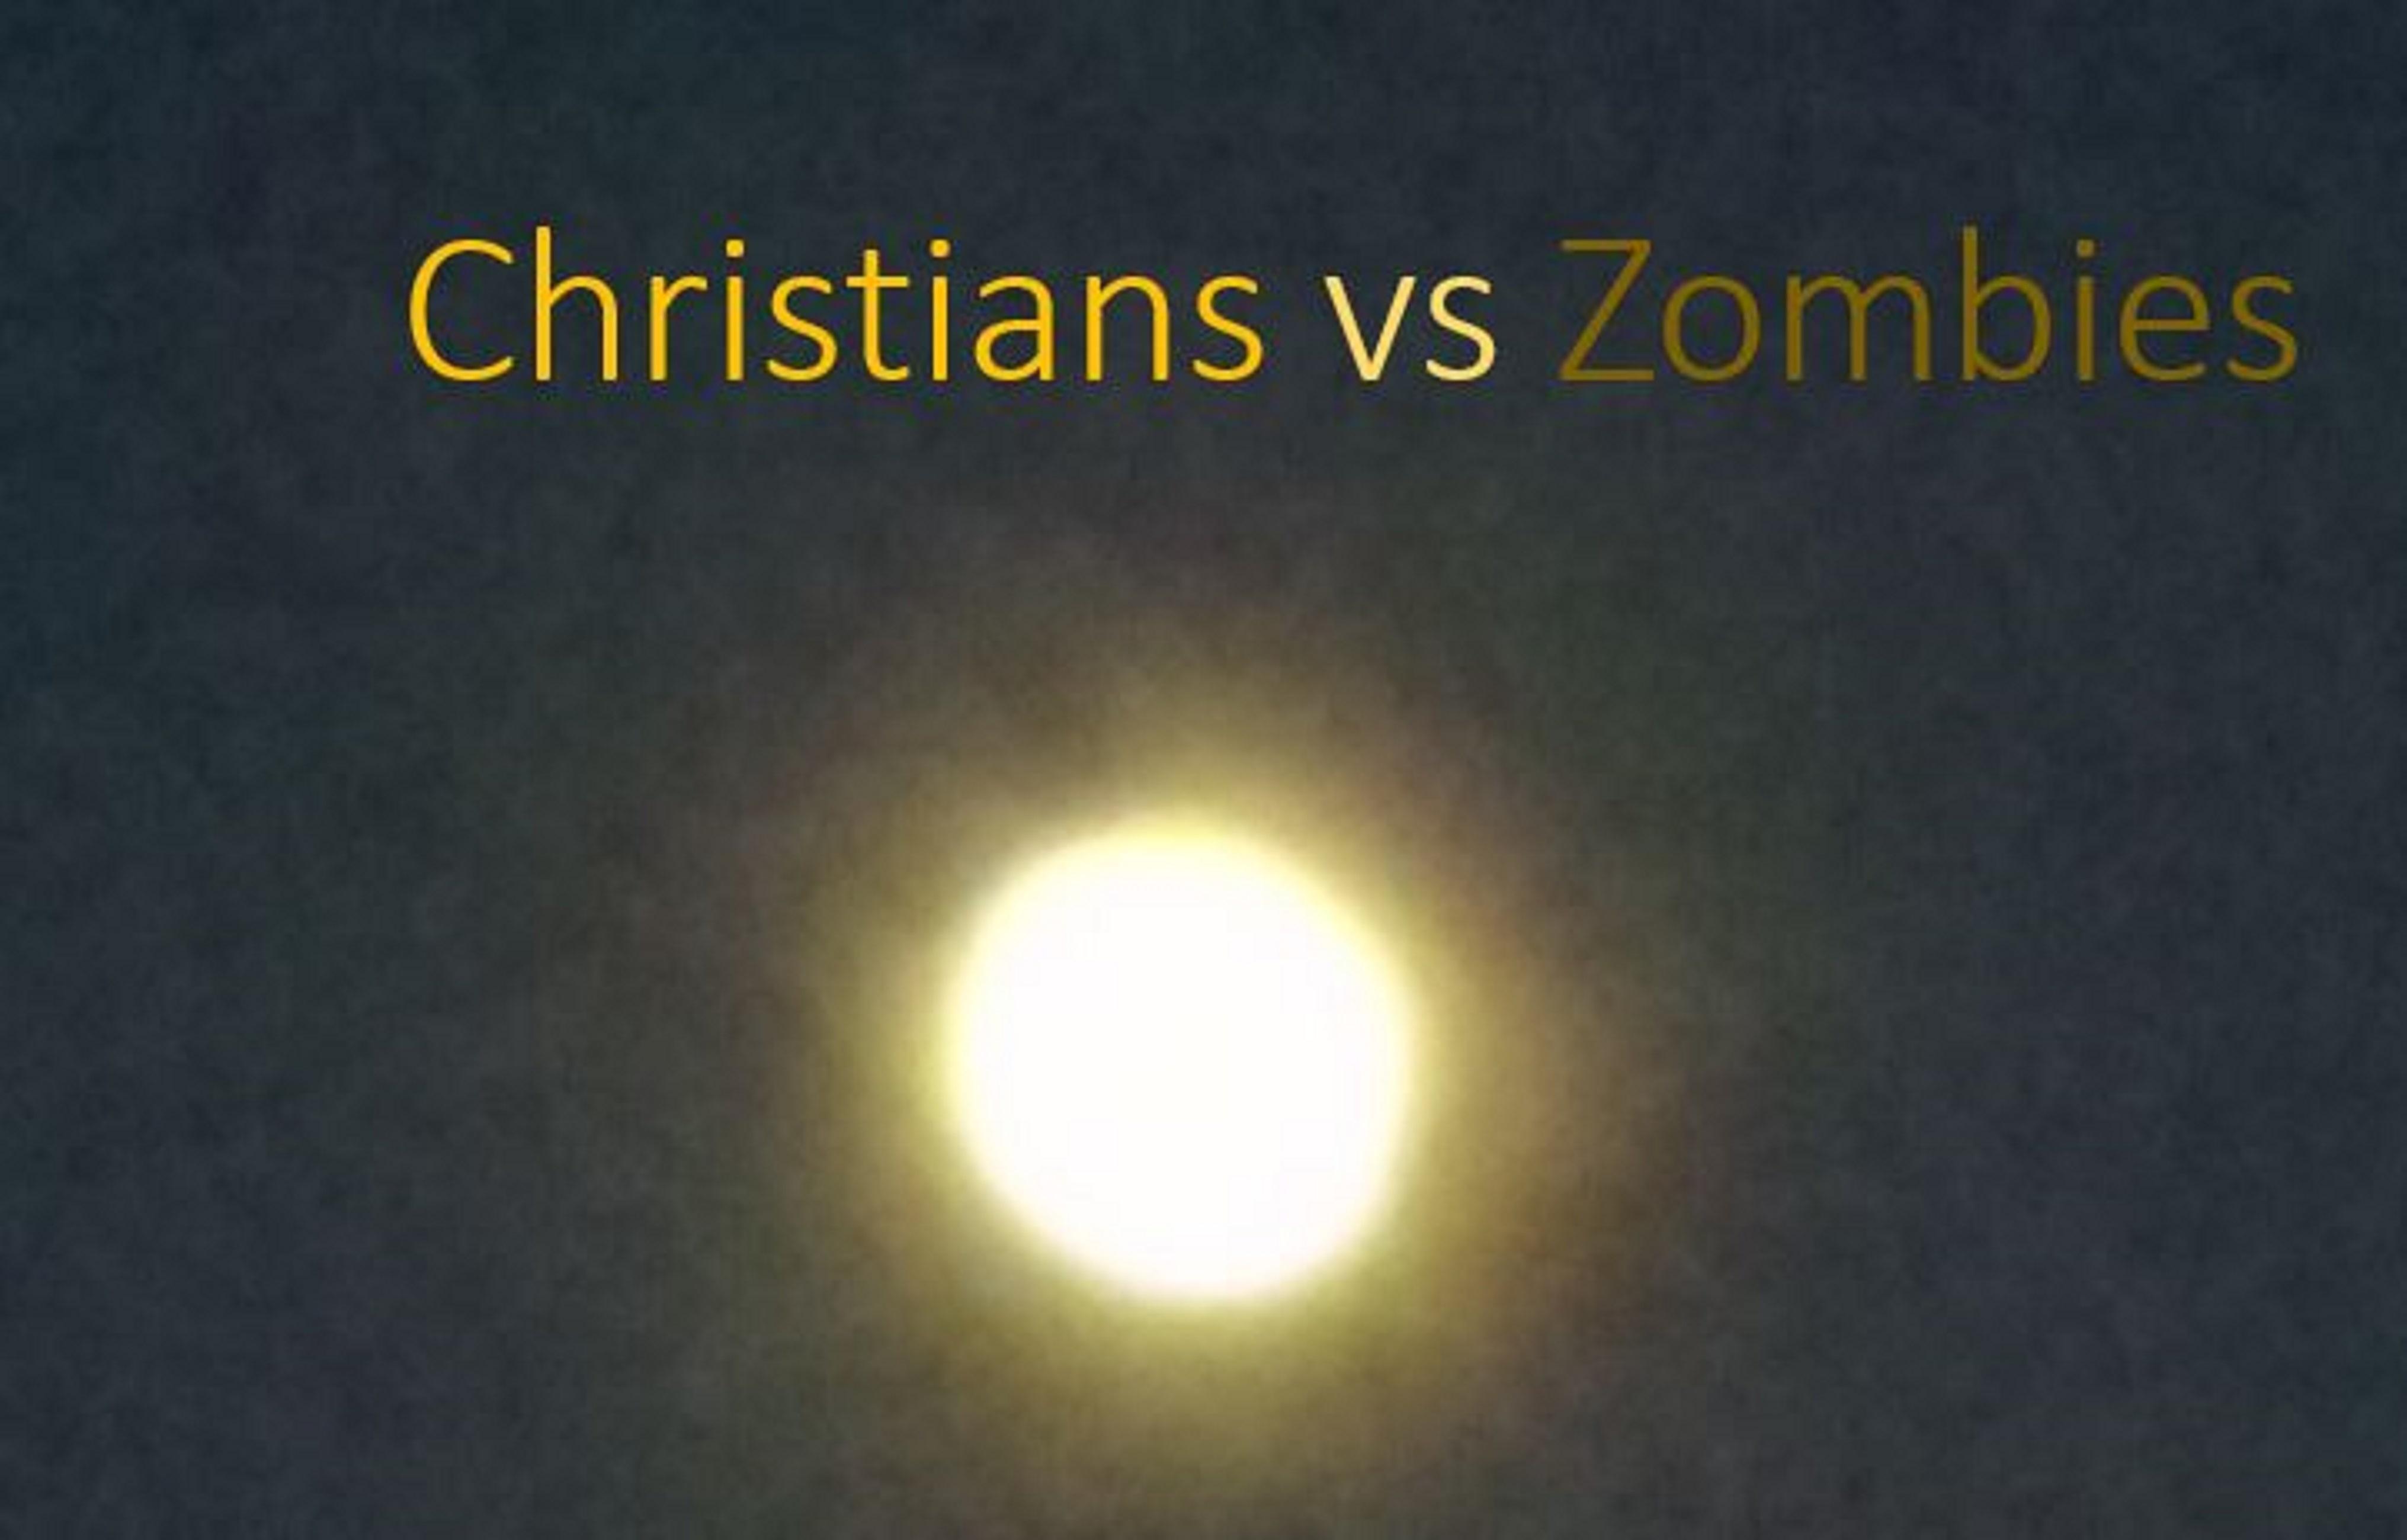 CHRISTIANS VS ZOMBIES